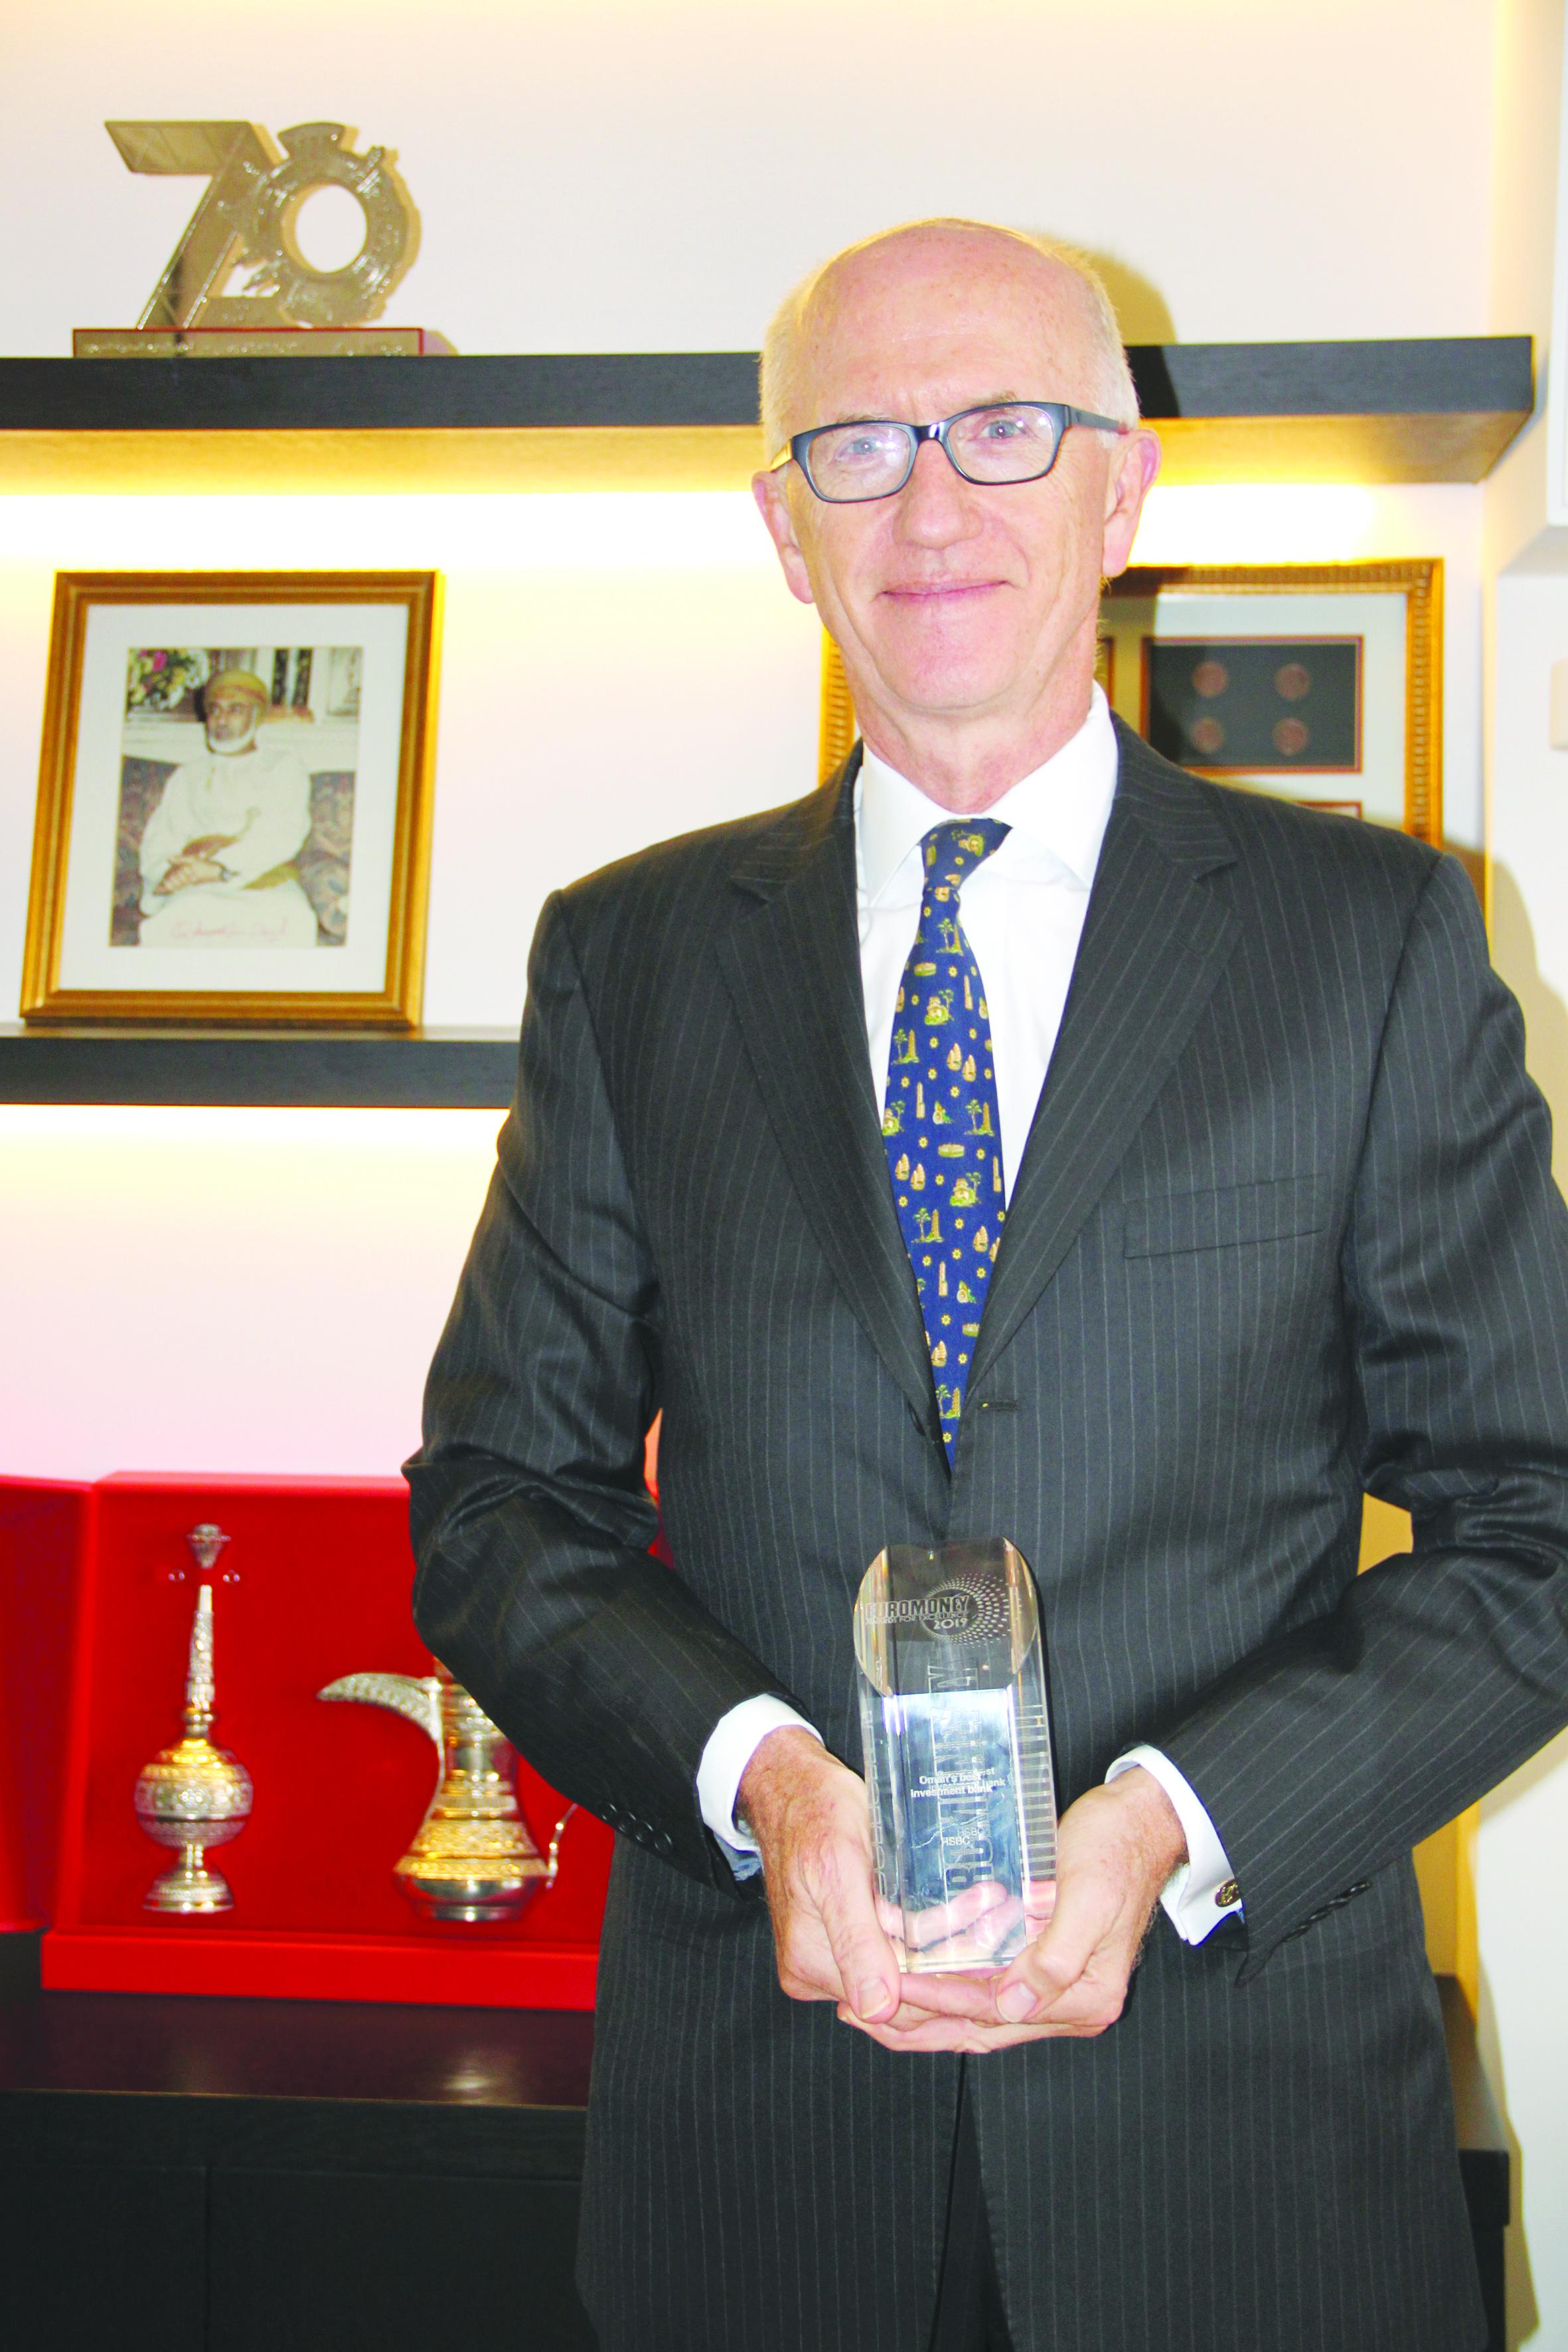 إتش إس بي سي عمان يفوز بجائزة يوروموني